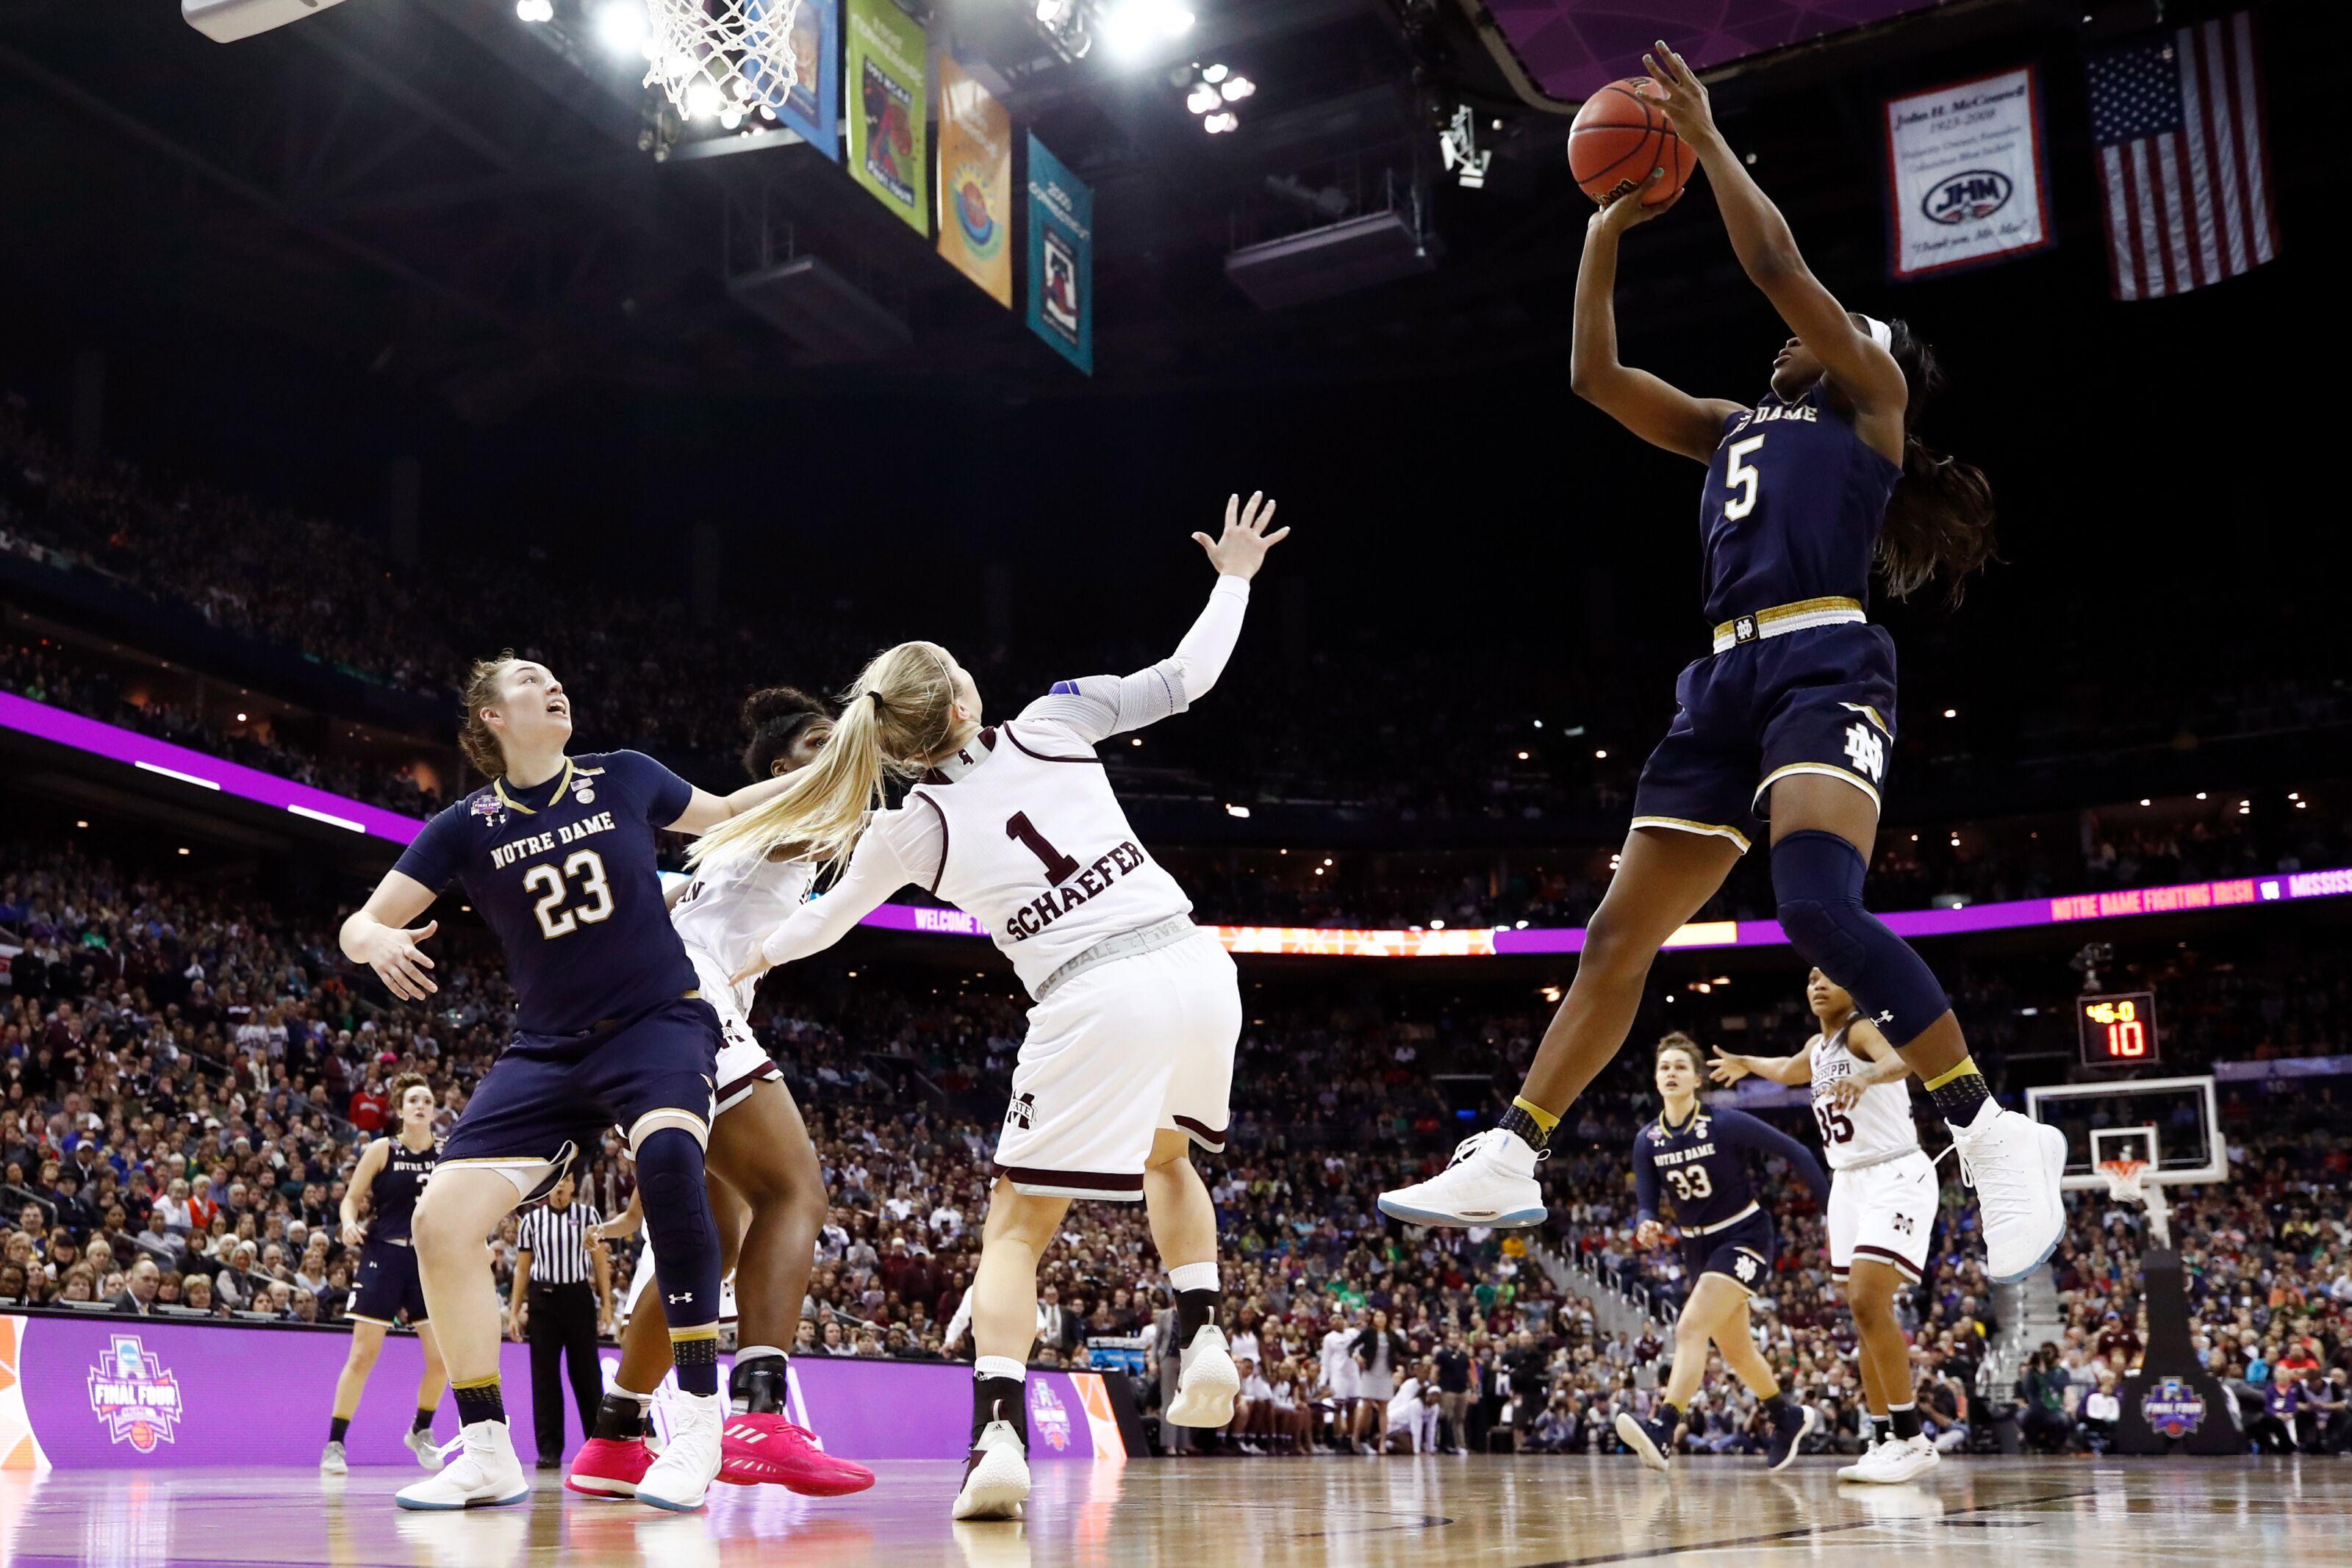 Notre Dame Women's Basketball: Irish Begin Title Defense with Bethune-Cookman